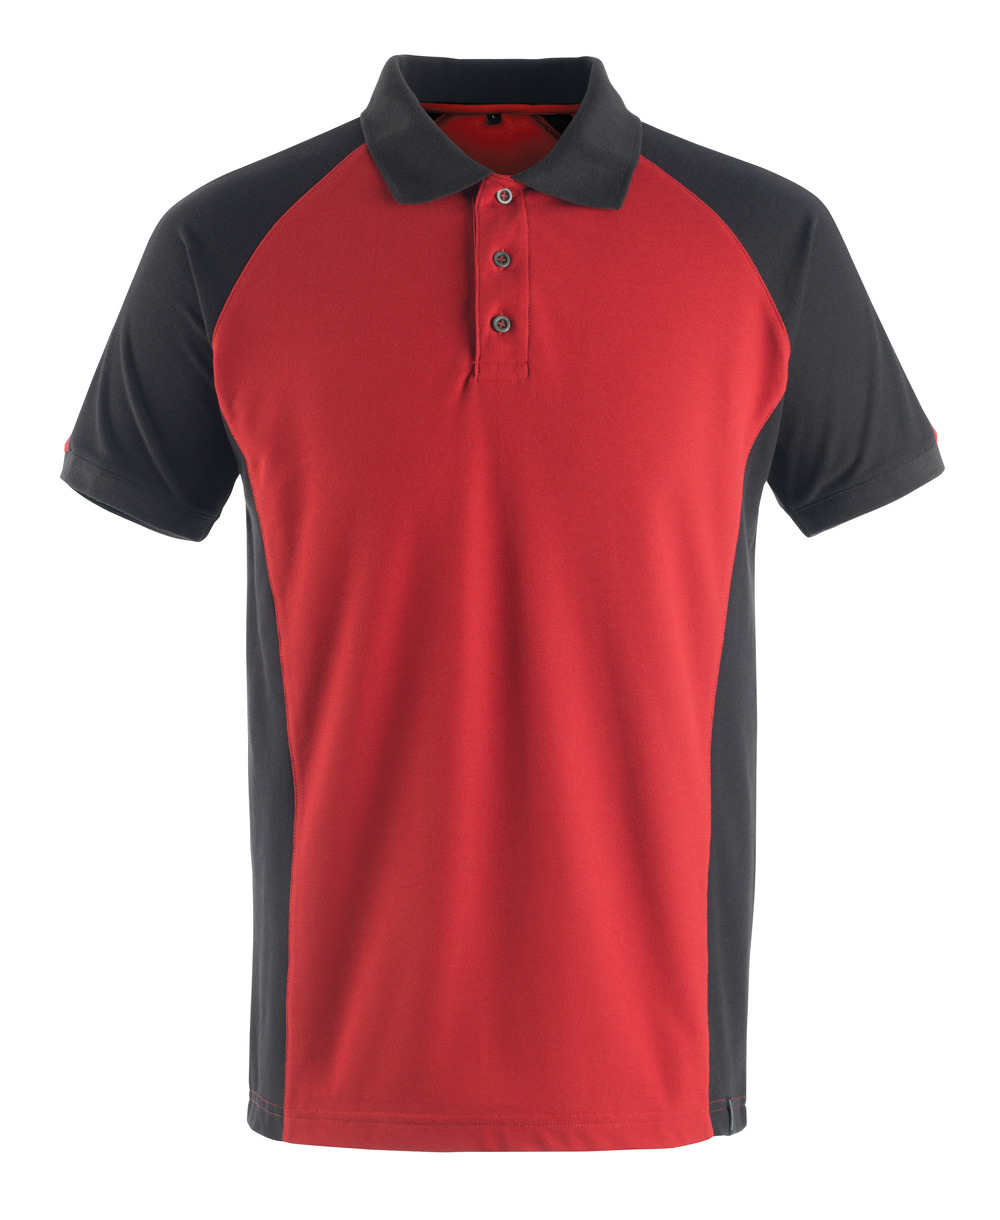 50569-961-0209 Polo Shirt - red/black